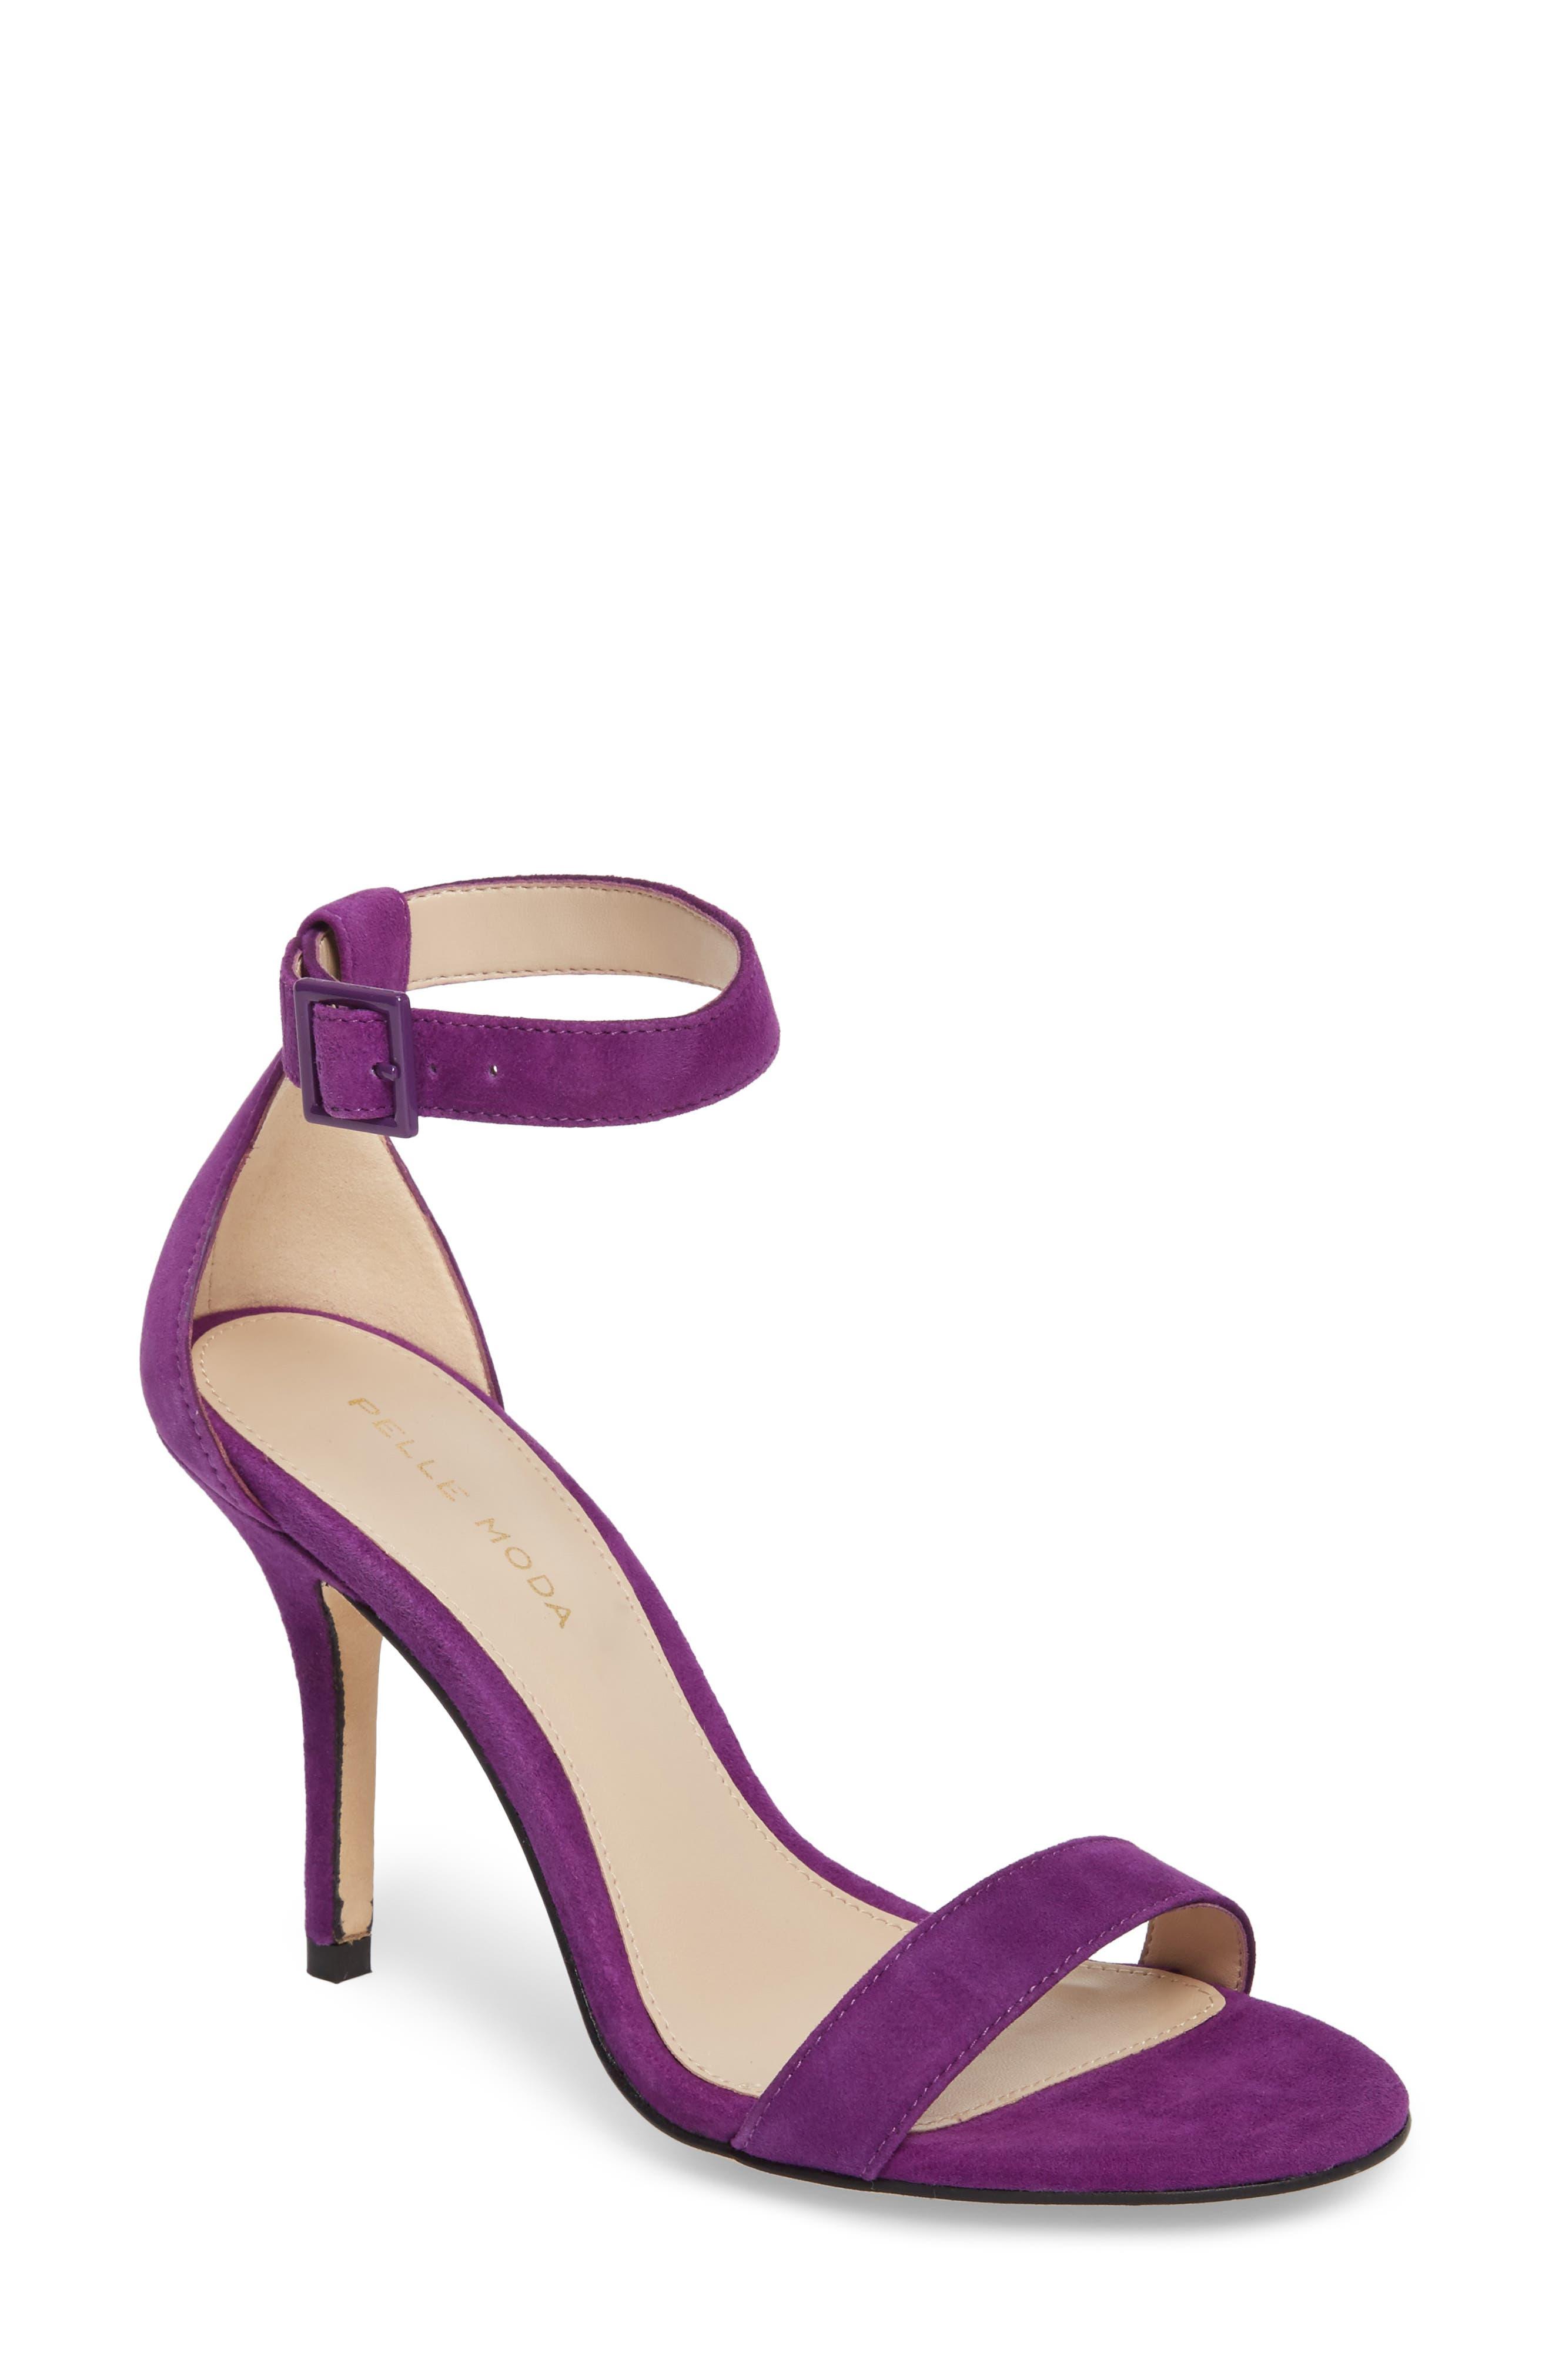 Main Image - Pelle Moda Kacey Sandal (Women)